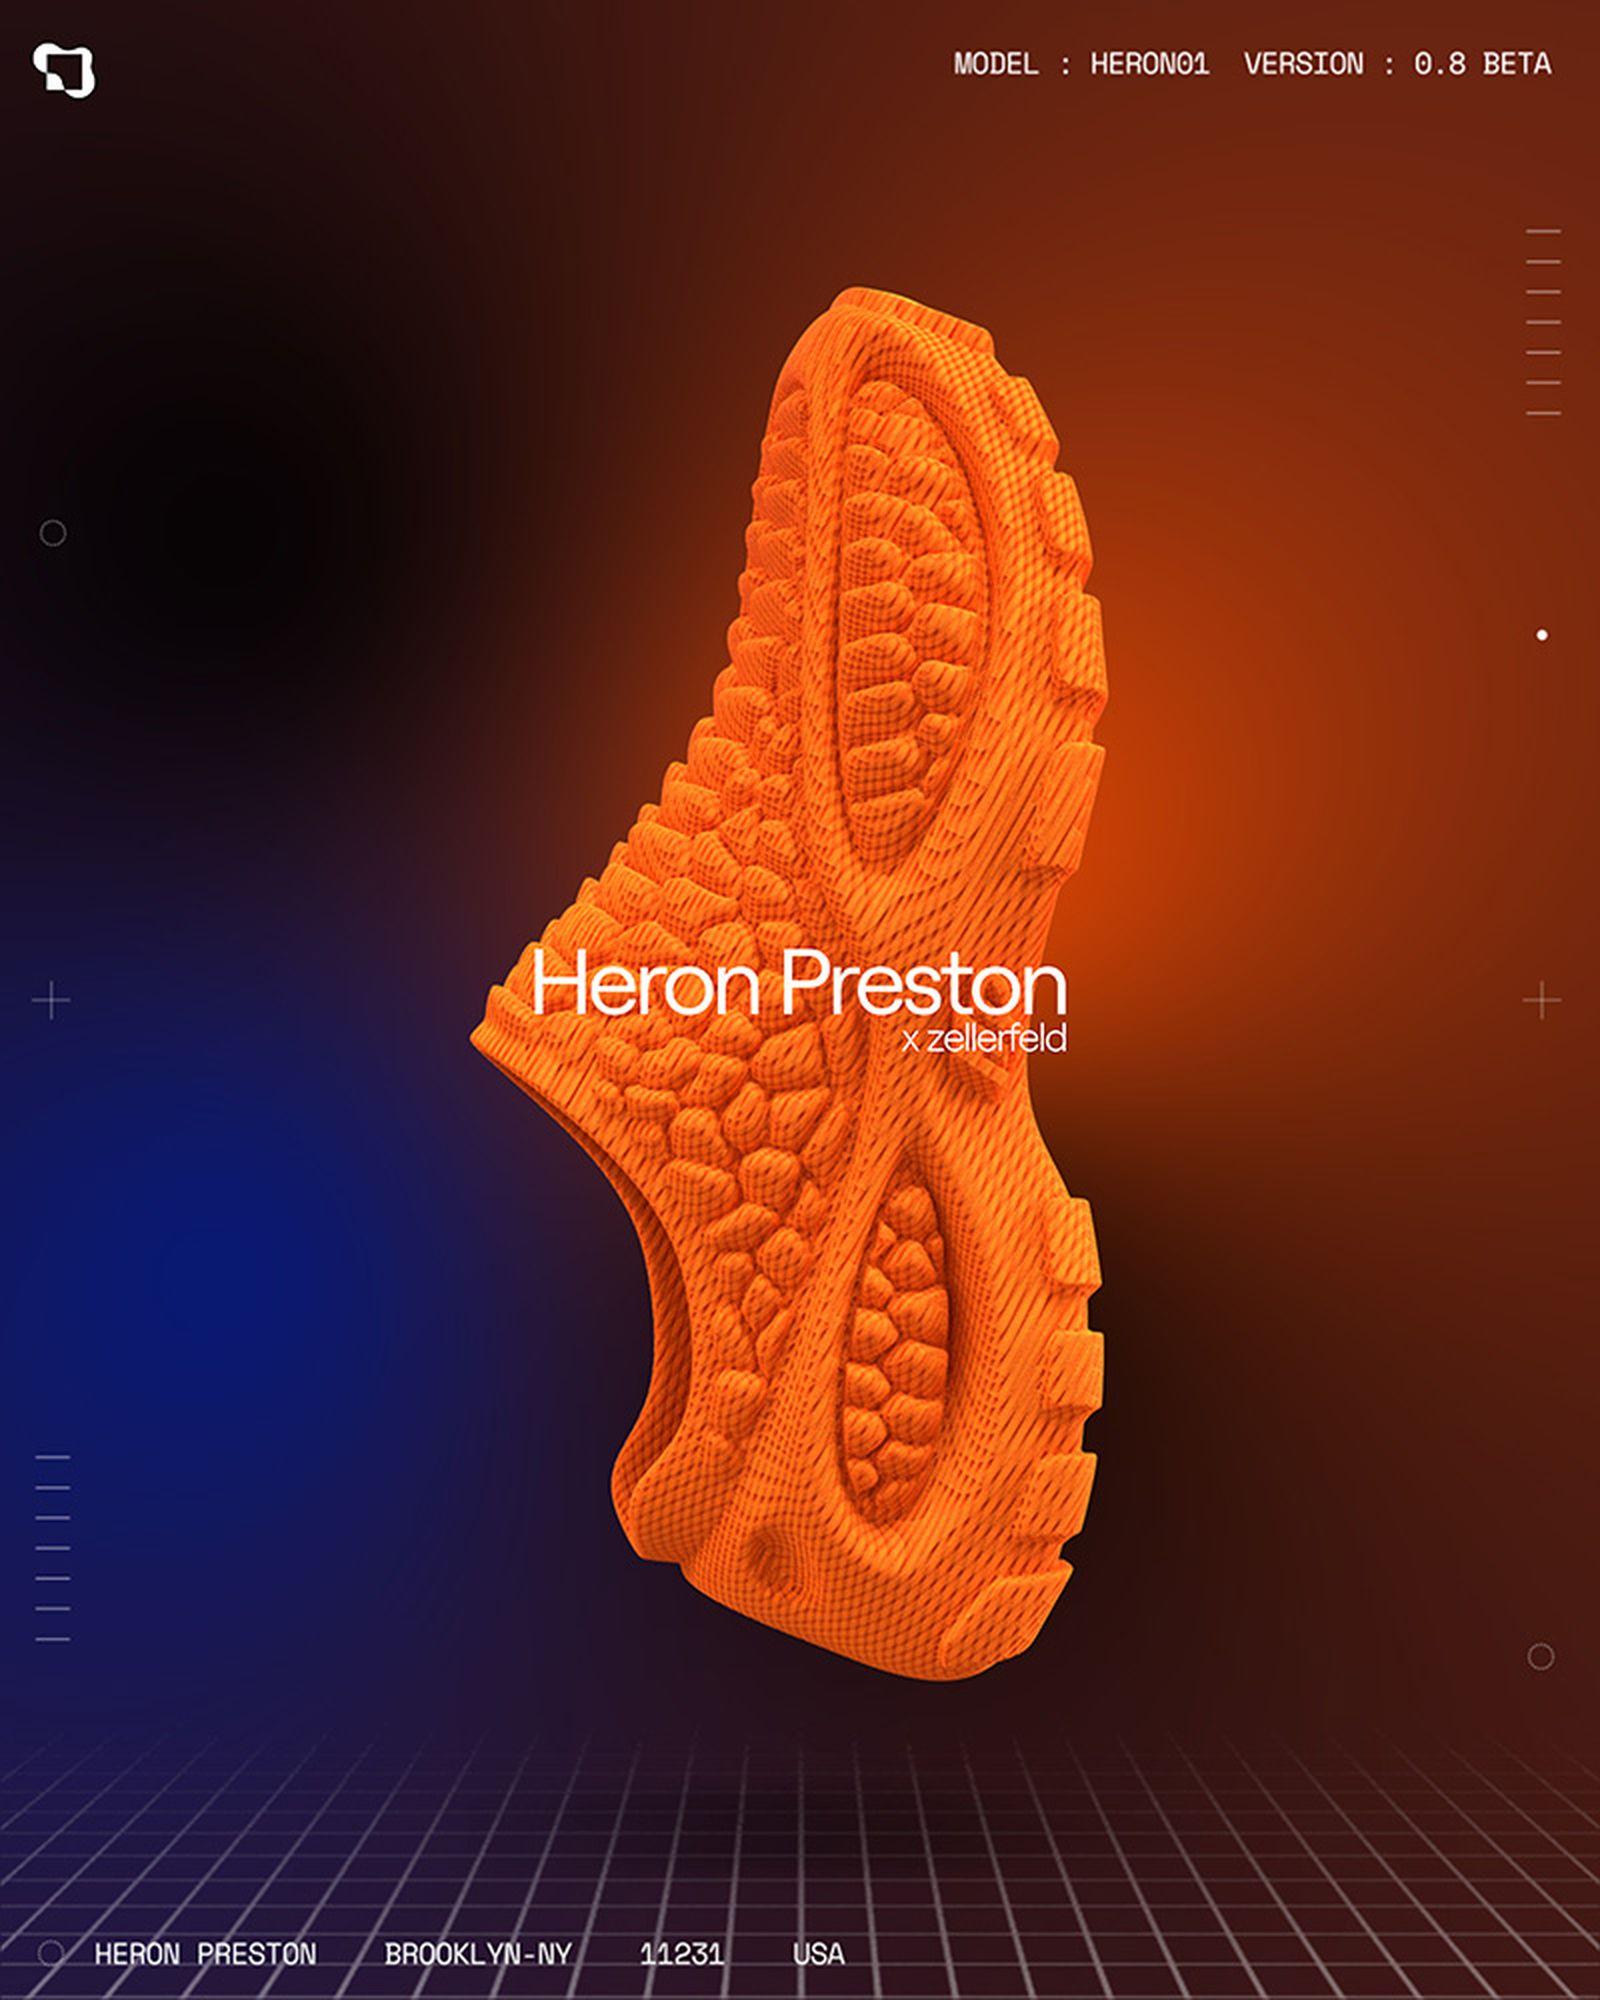 heron-preston-zellerfeld-heron01-release-date-price-05